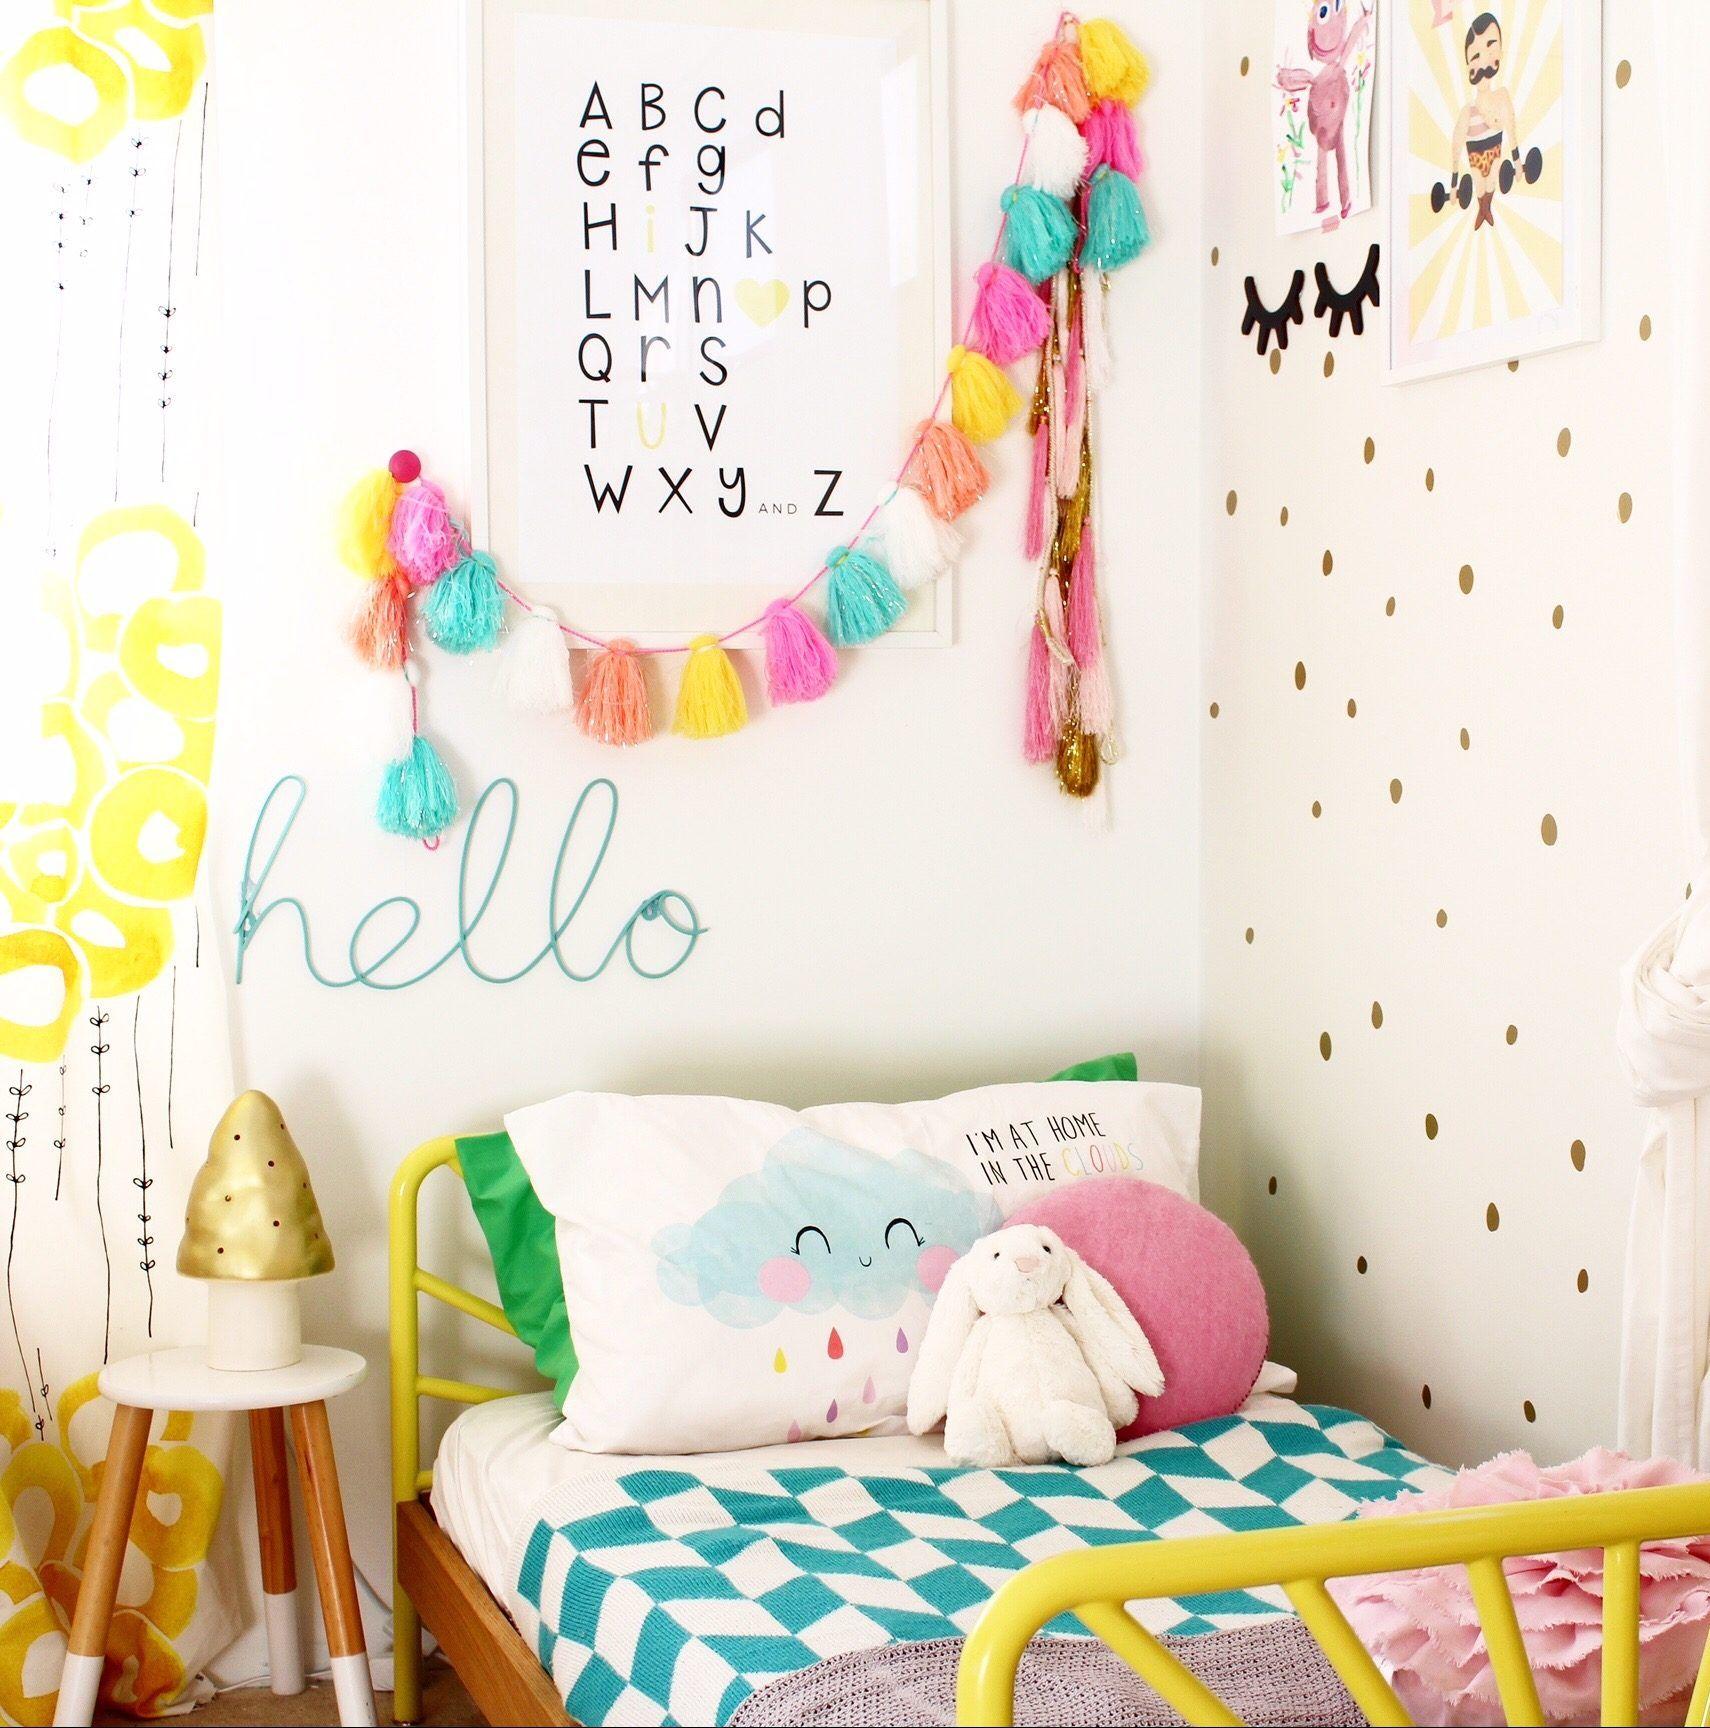 Alphabet Chart - adorable kids or nursery wall art decor by four cheeky  monkeys